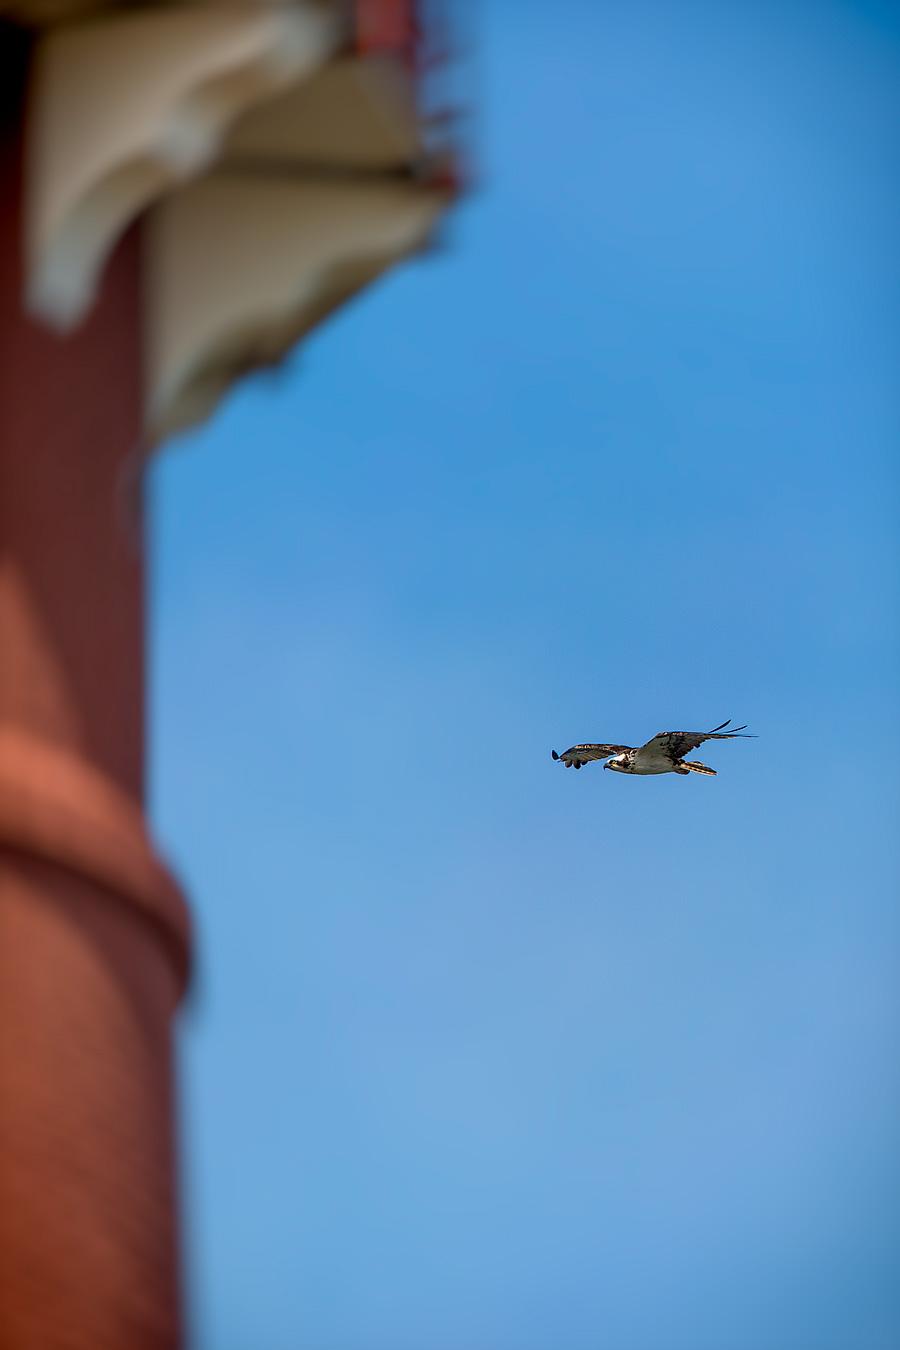 Bonus Barnegat Light Shot: Osprey, comin' in hot!